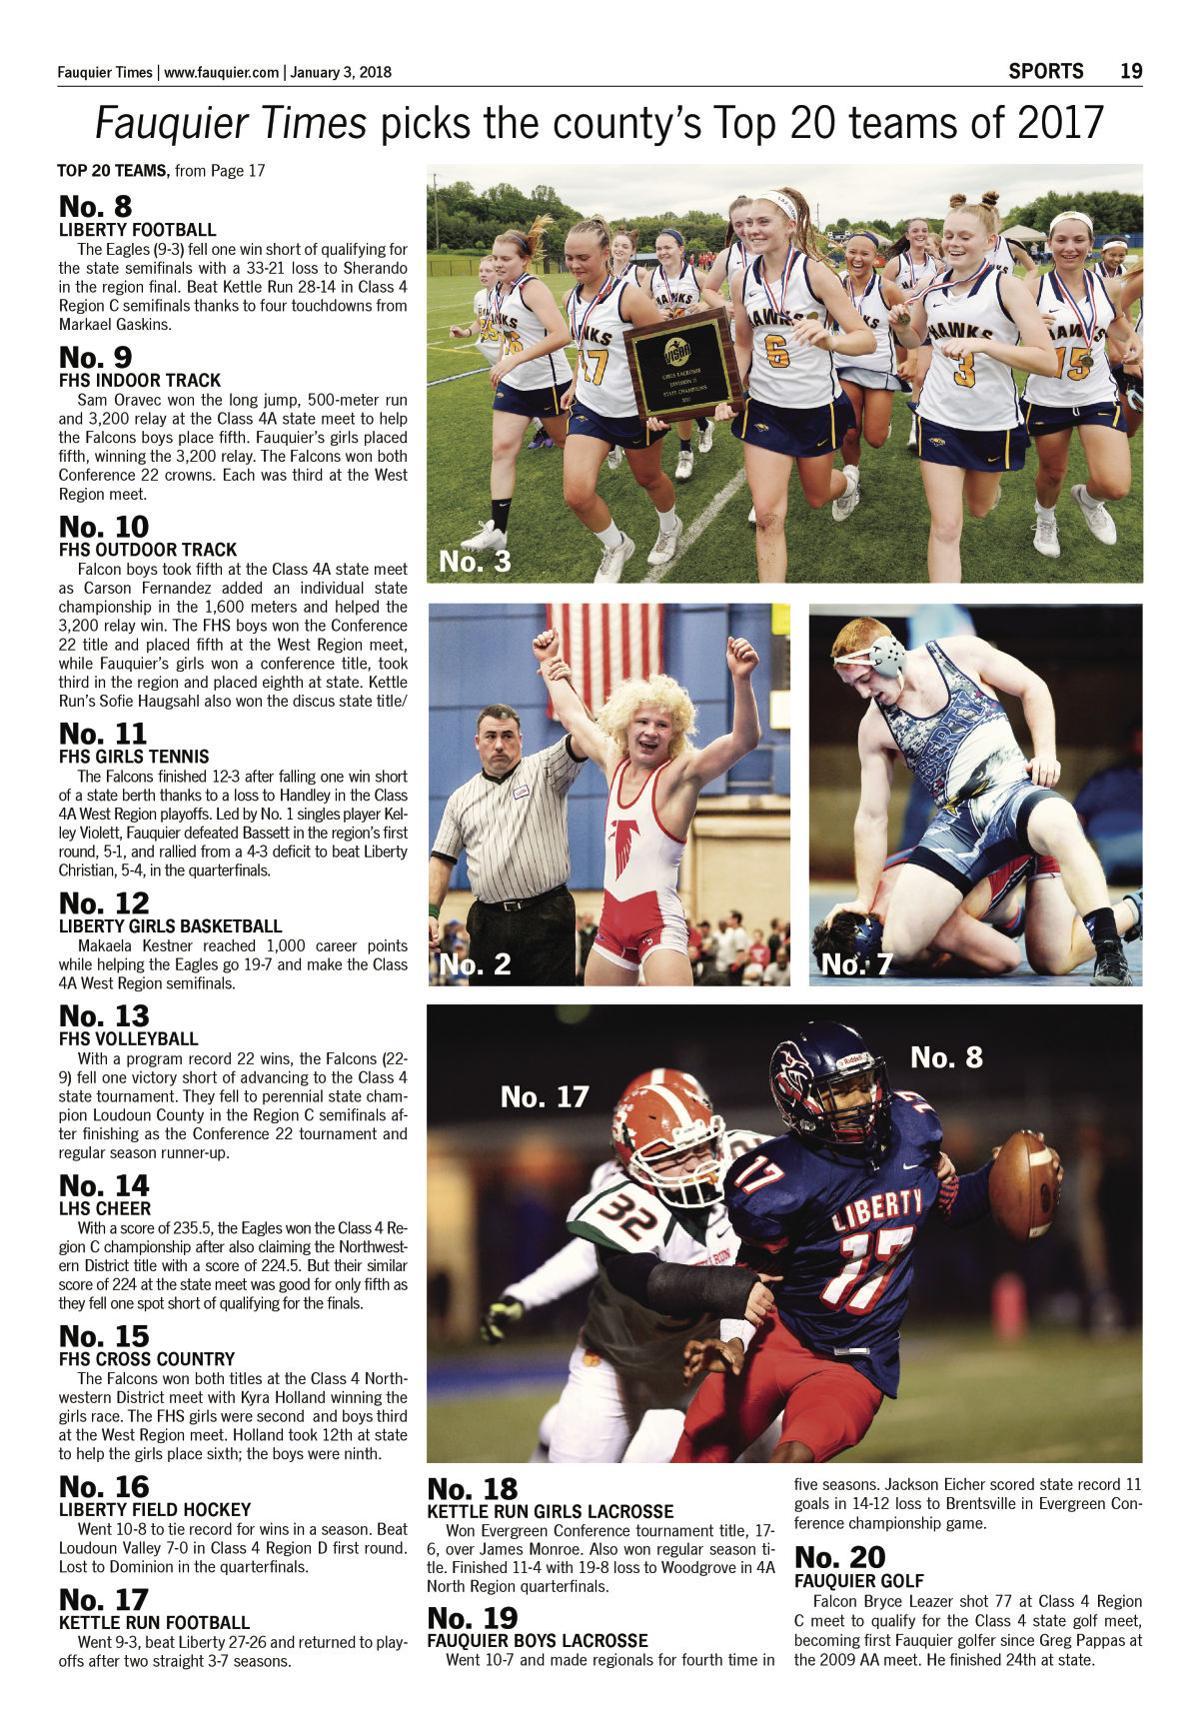 B_Top_20_Sports_Accomplishments